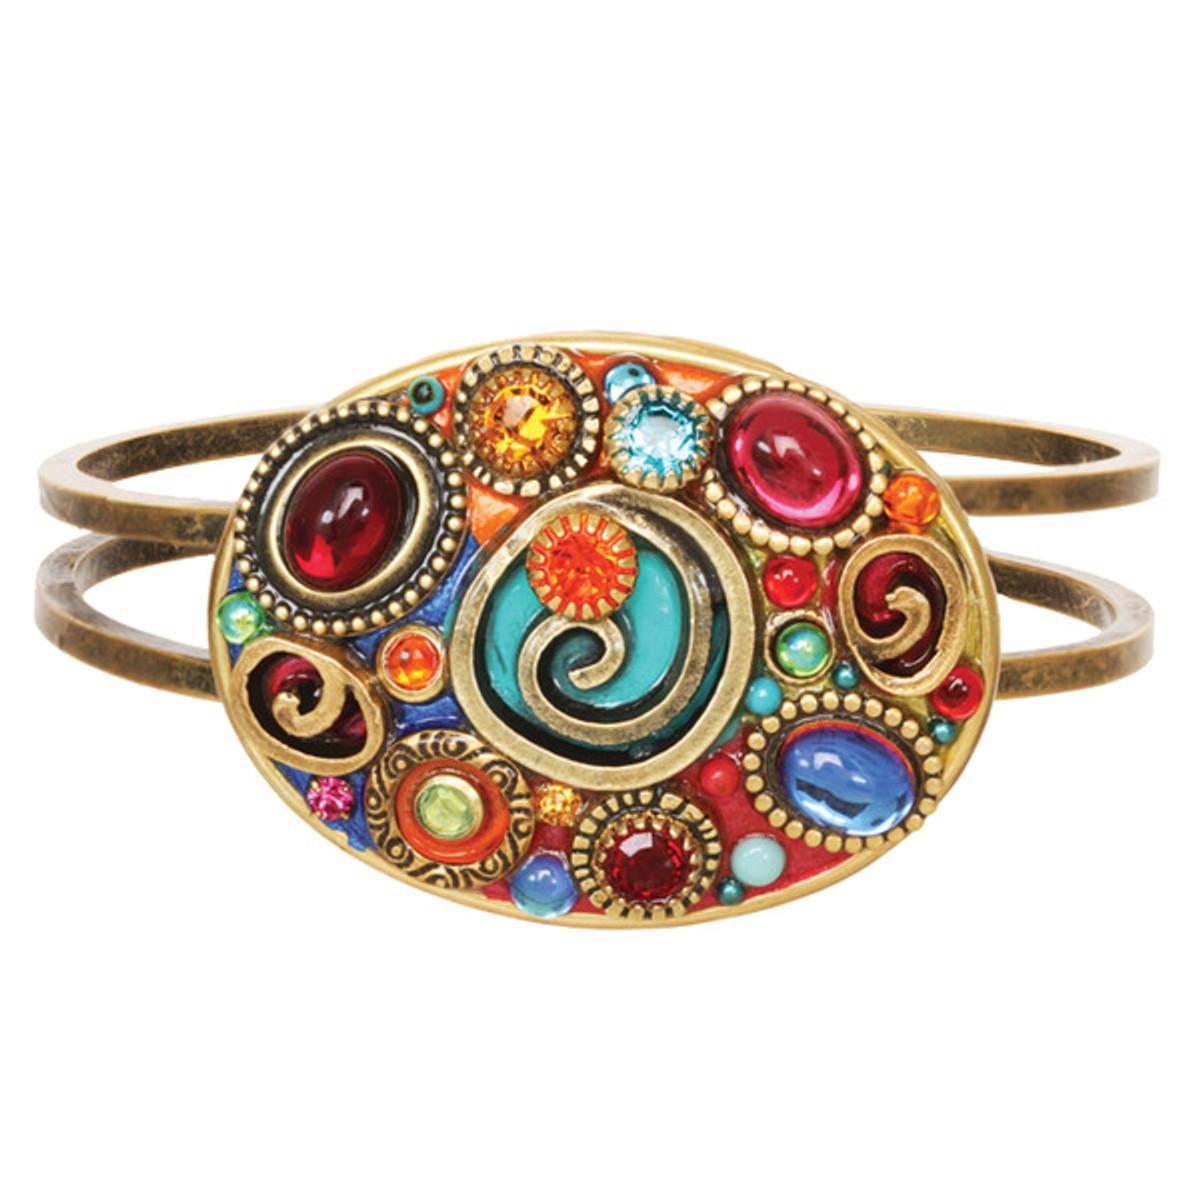 Michal Golanjewelry Confetti Bracelet